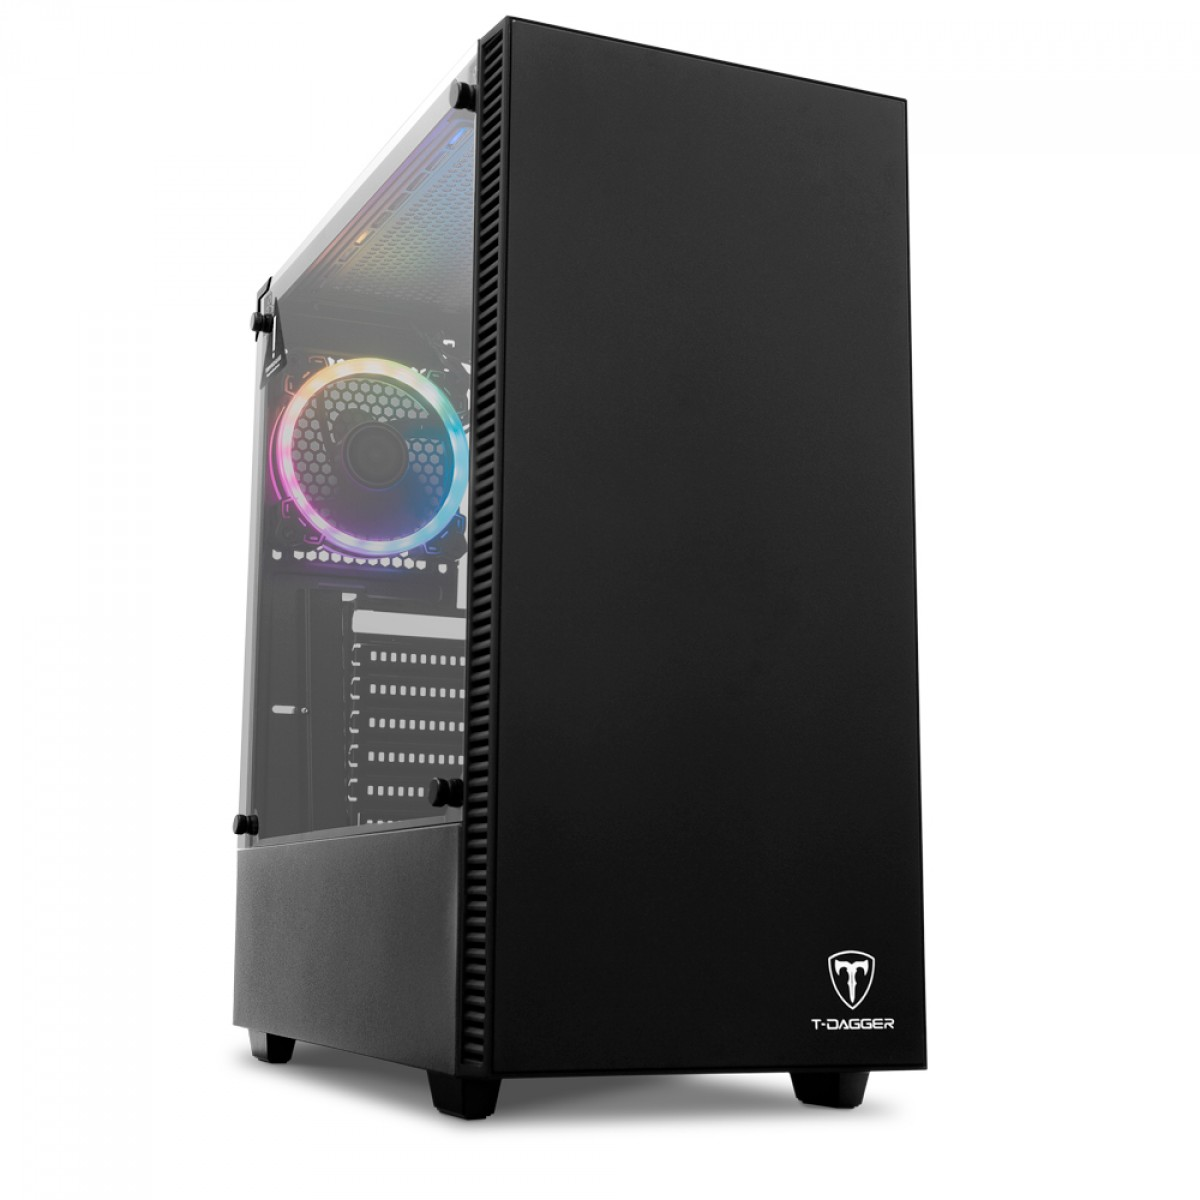 Computador Gamer, RYZEN 5 3600, Placas de Vídeo GTX-1050TI 4GB DDR5, 8GB DDR4, SSD 240GB